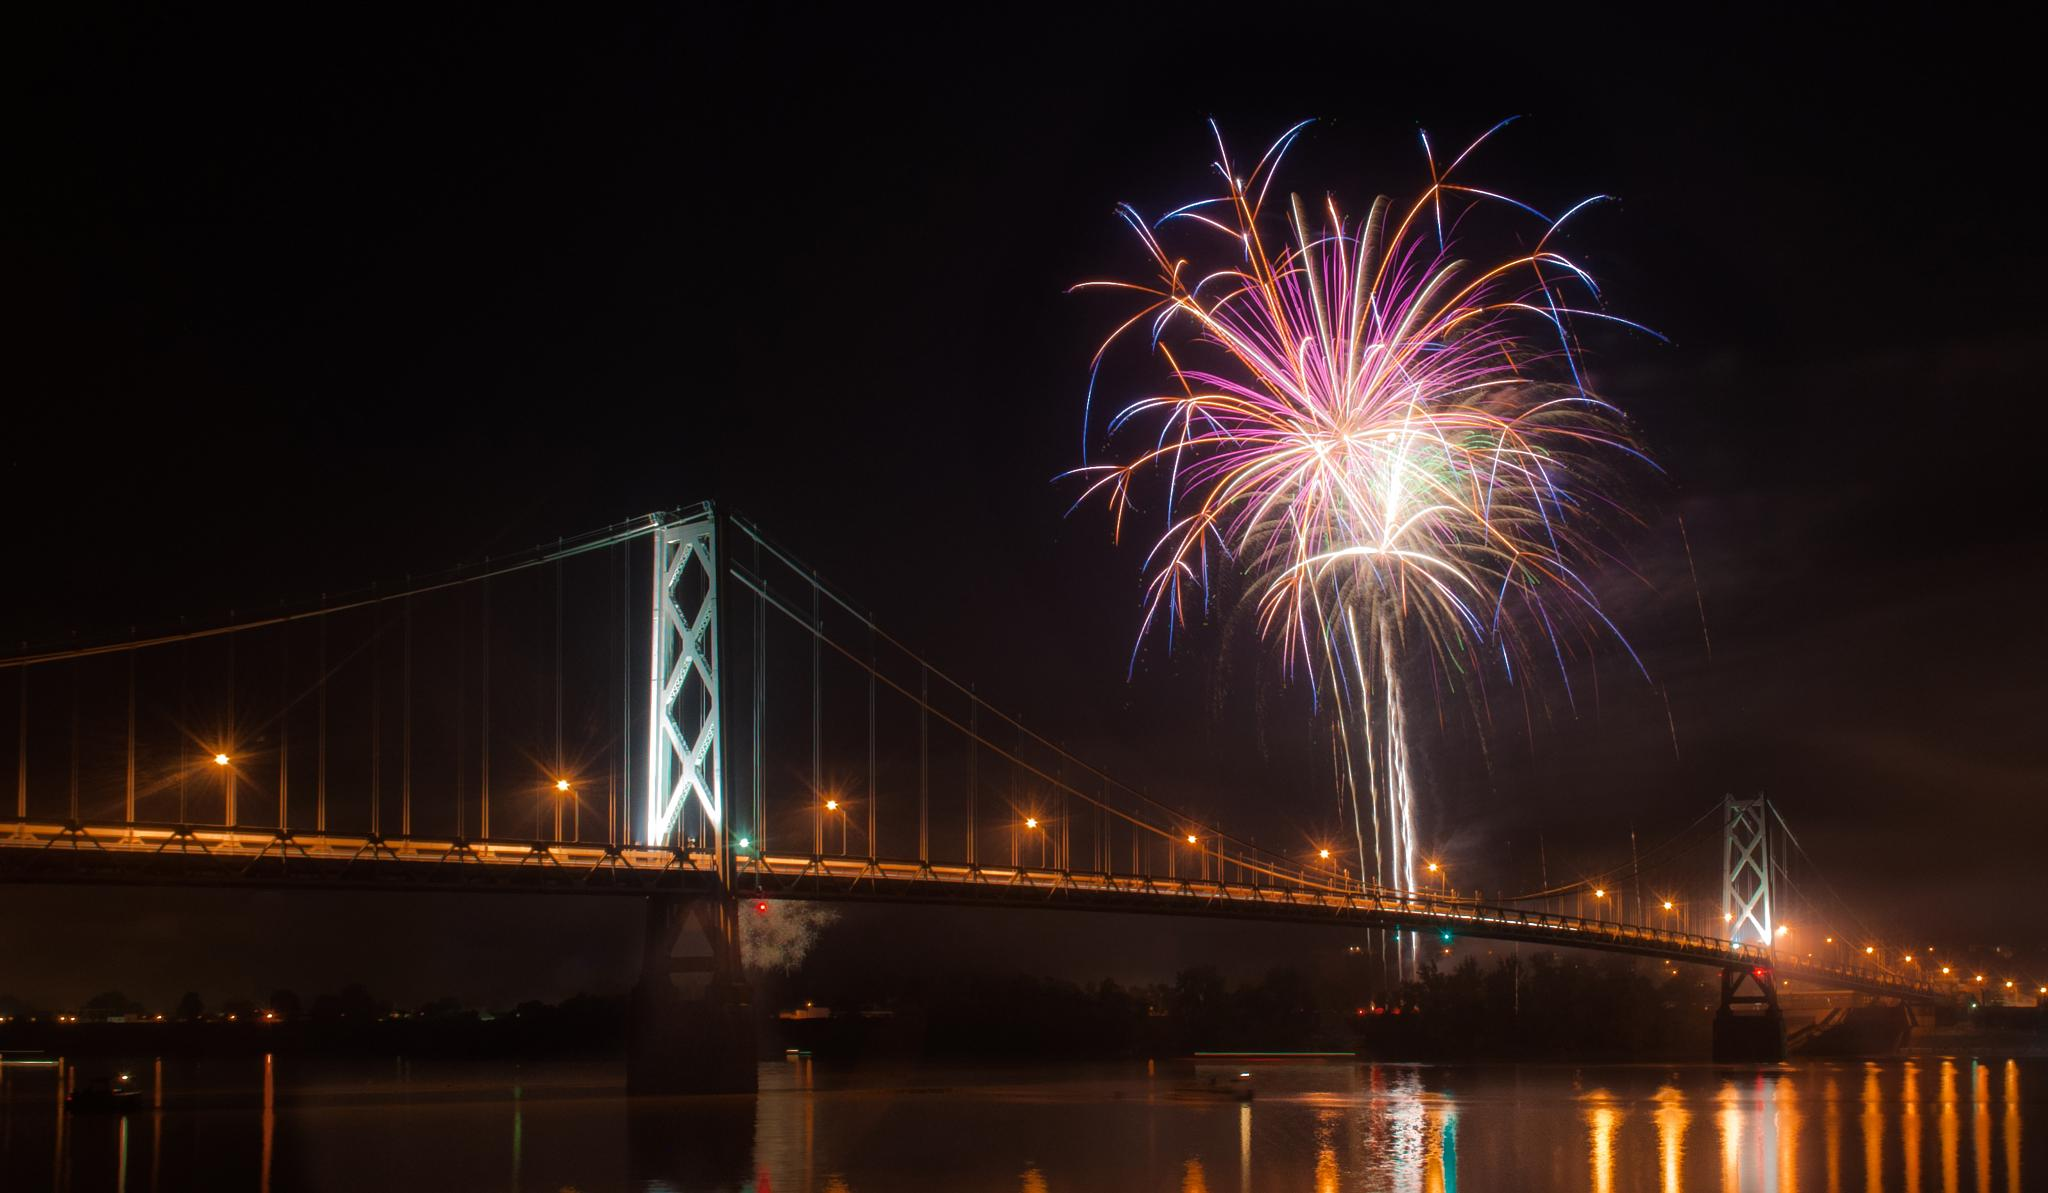 Fire On The Bridge by photojam2014